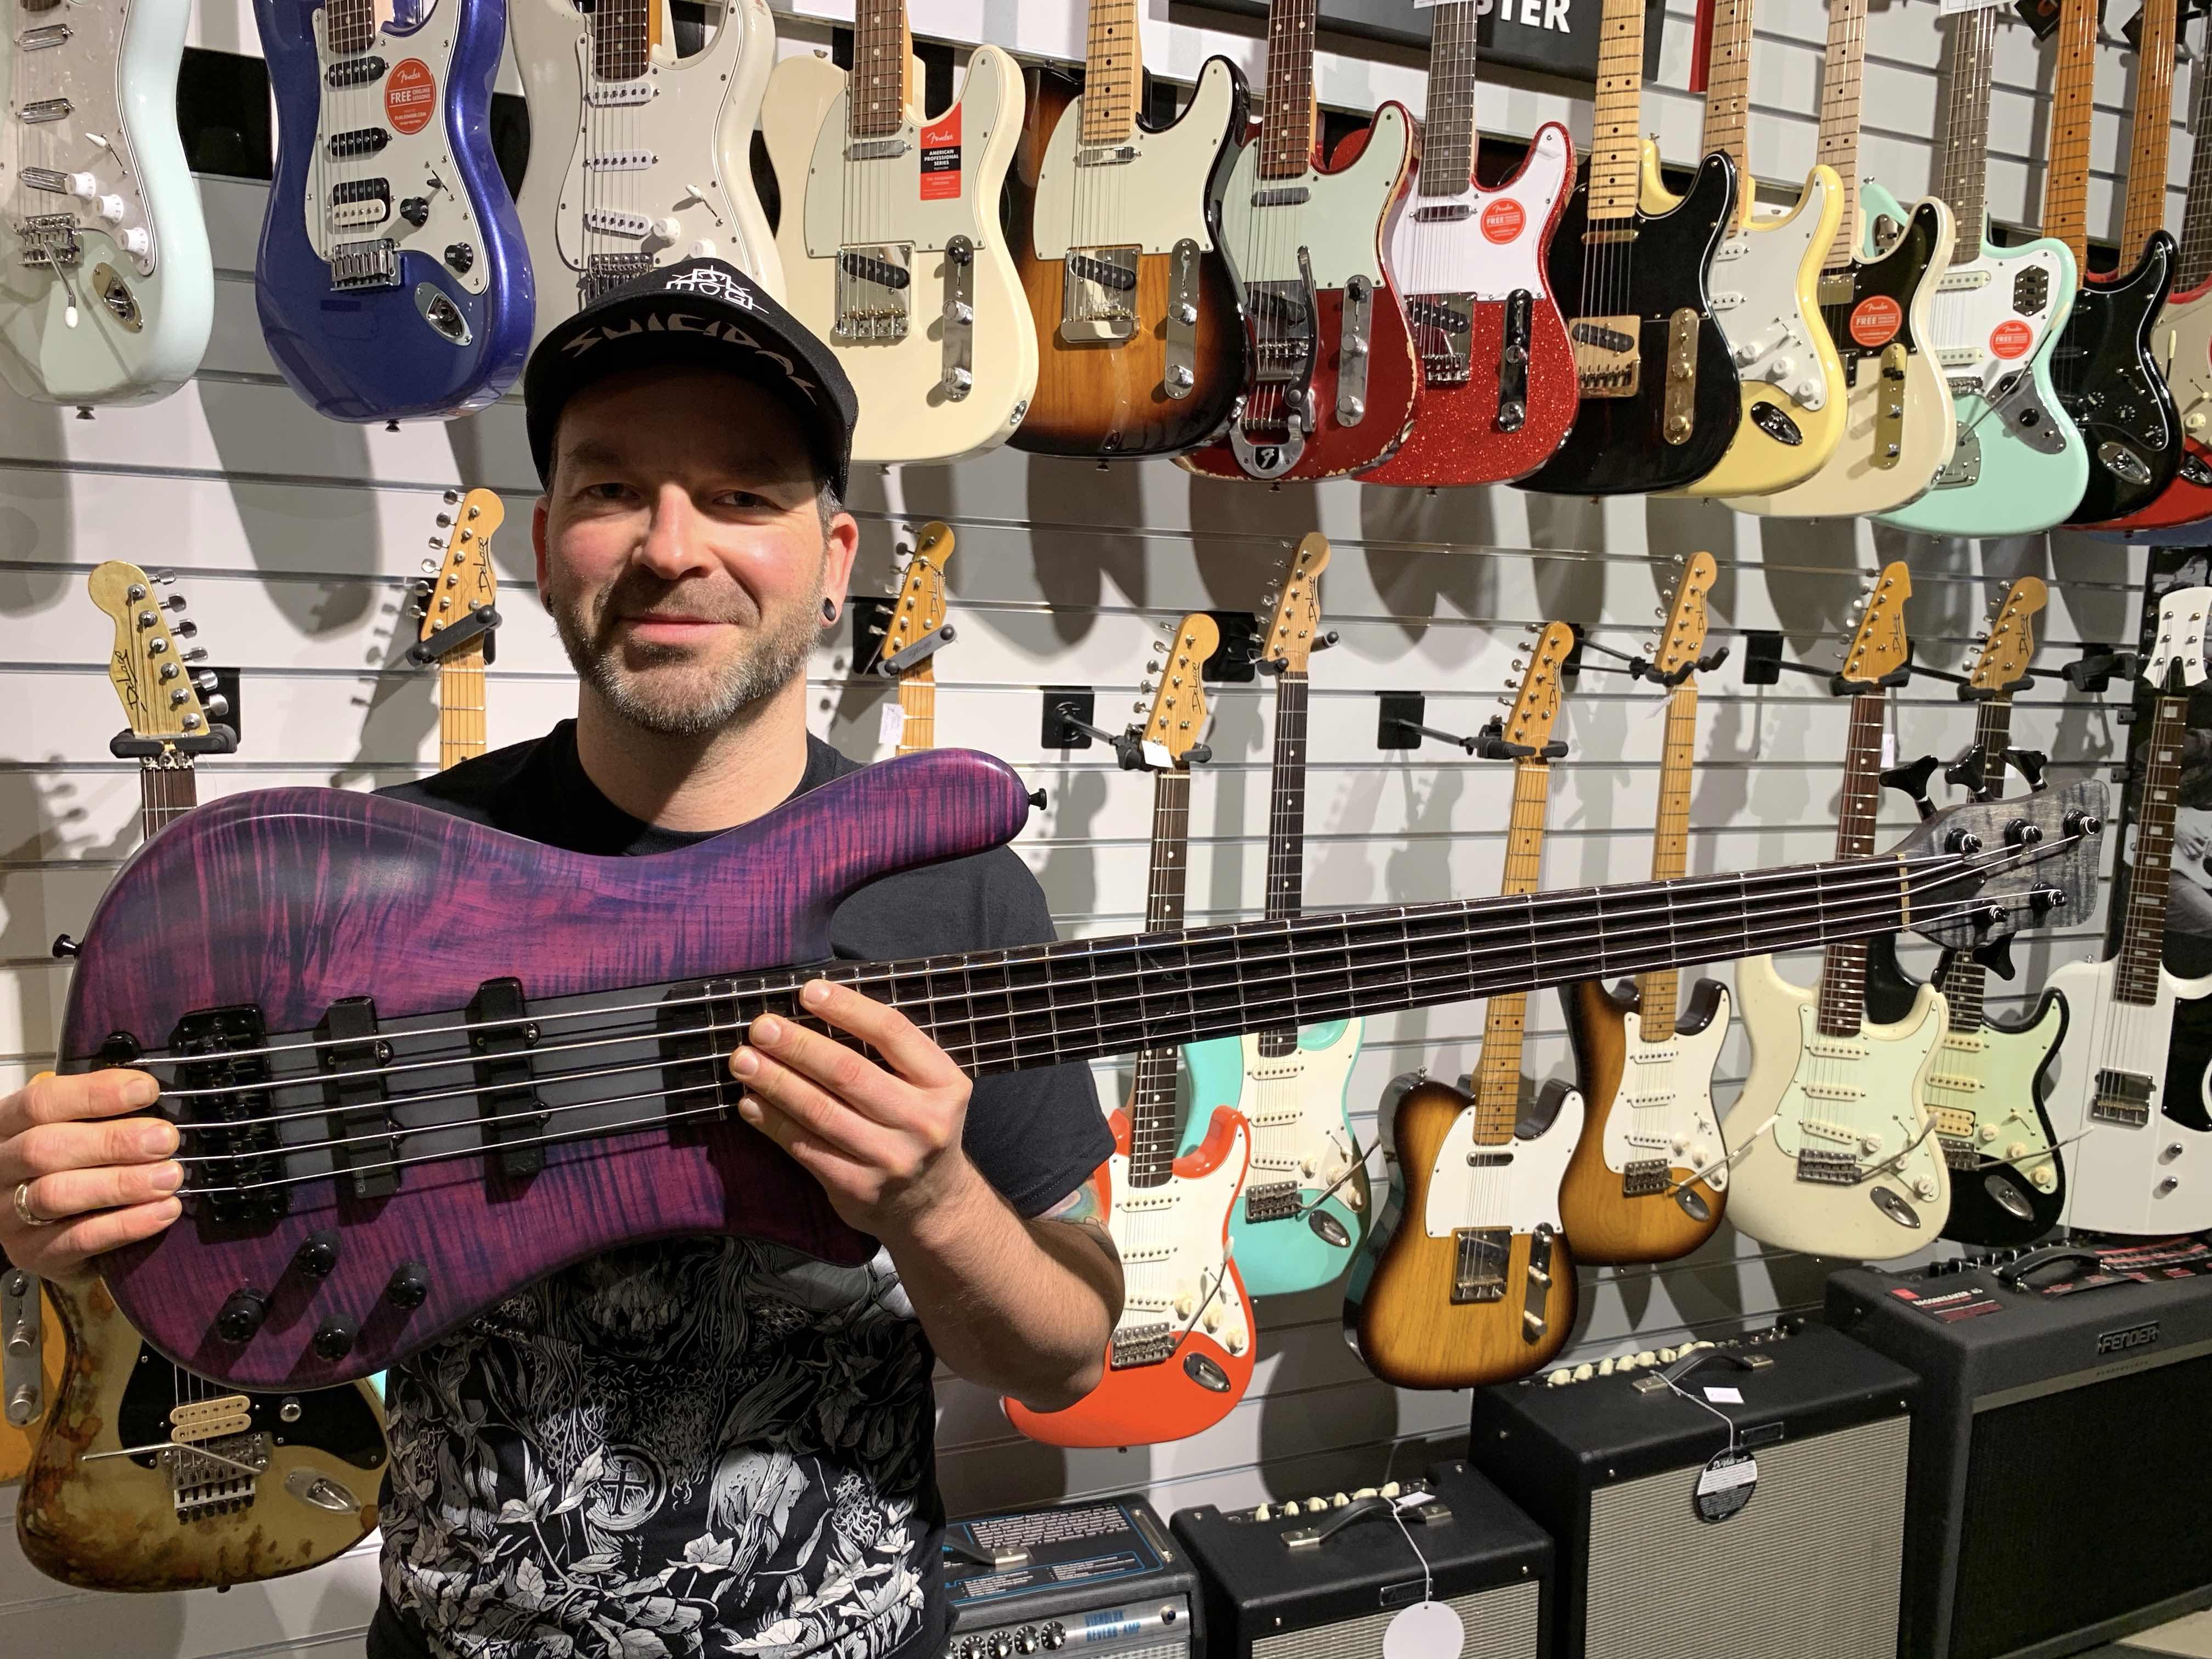 robert-trujillo-warwick-streamer-signature-bass-purple-nirvana-black-hardline-music-martin-iordanidis